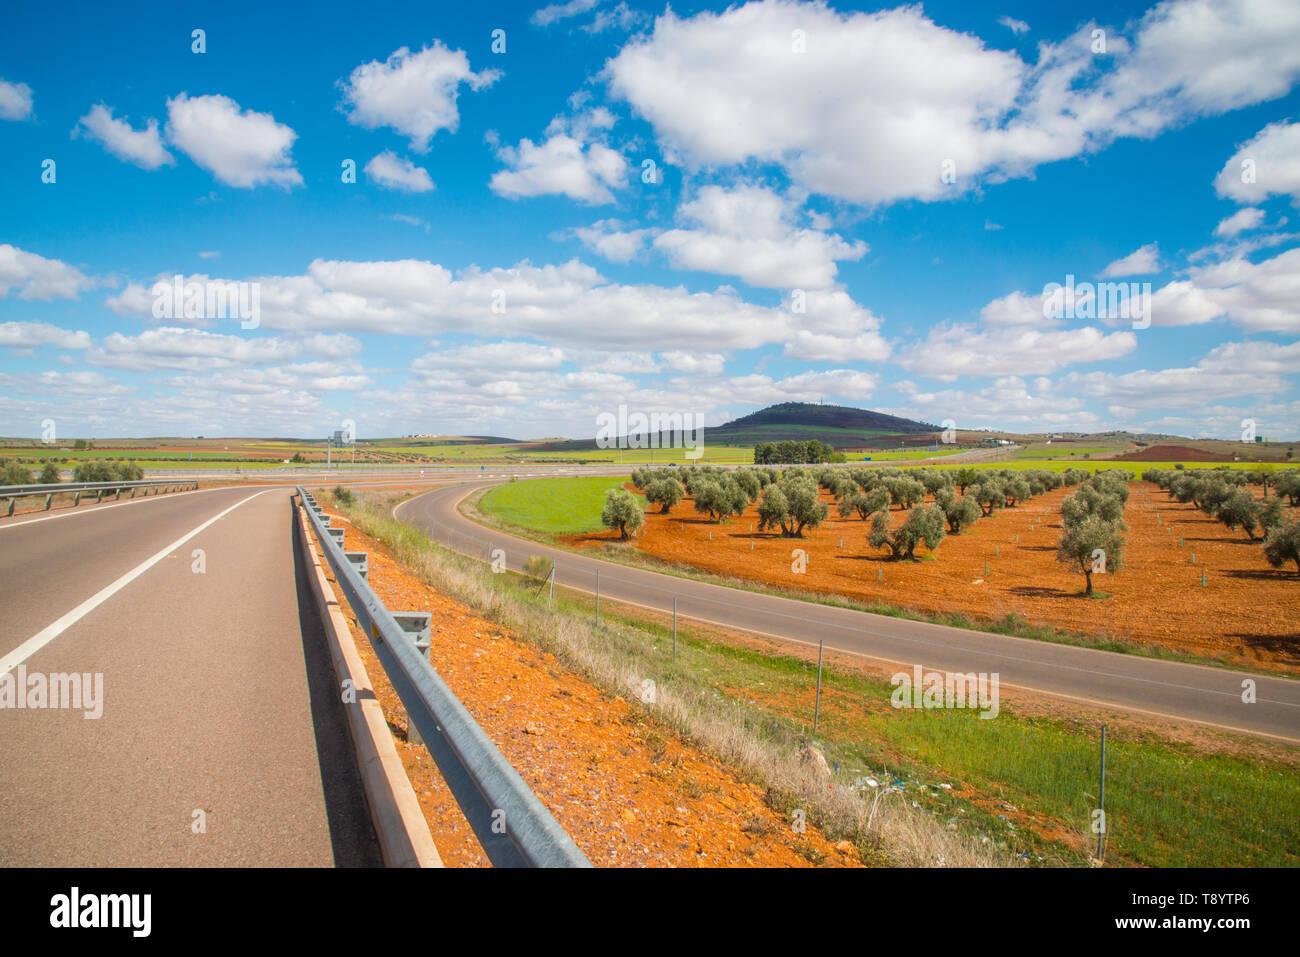 Freeway and olive grove. Almagro, Ciudad Real province, Castilla La Mancha, Spain. Stock Photo